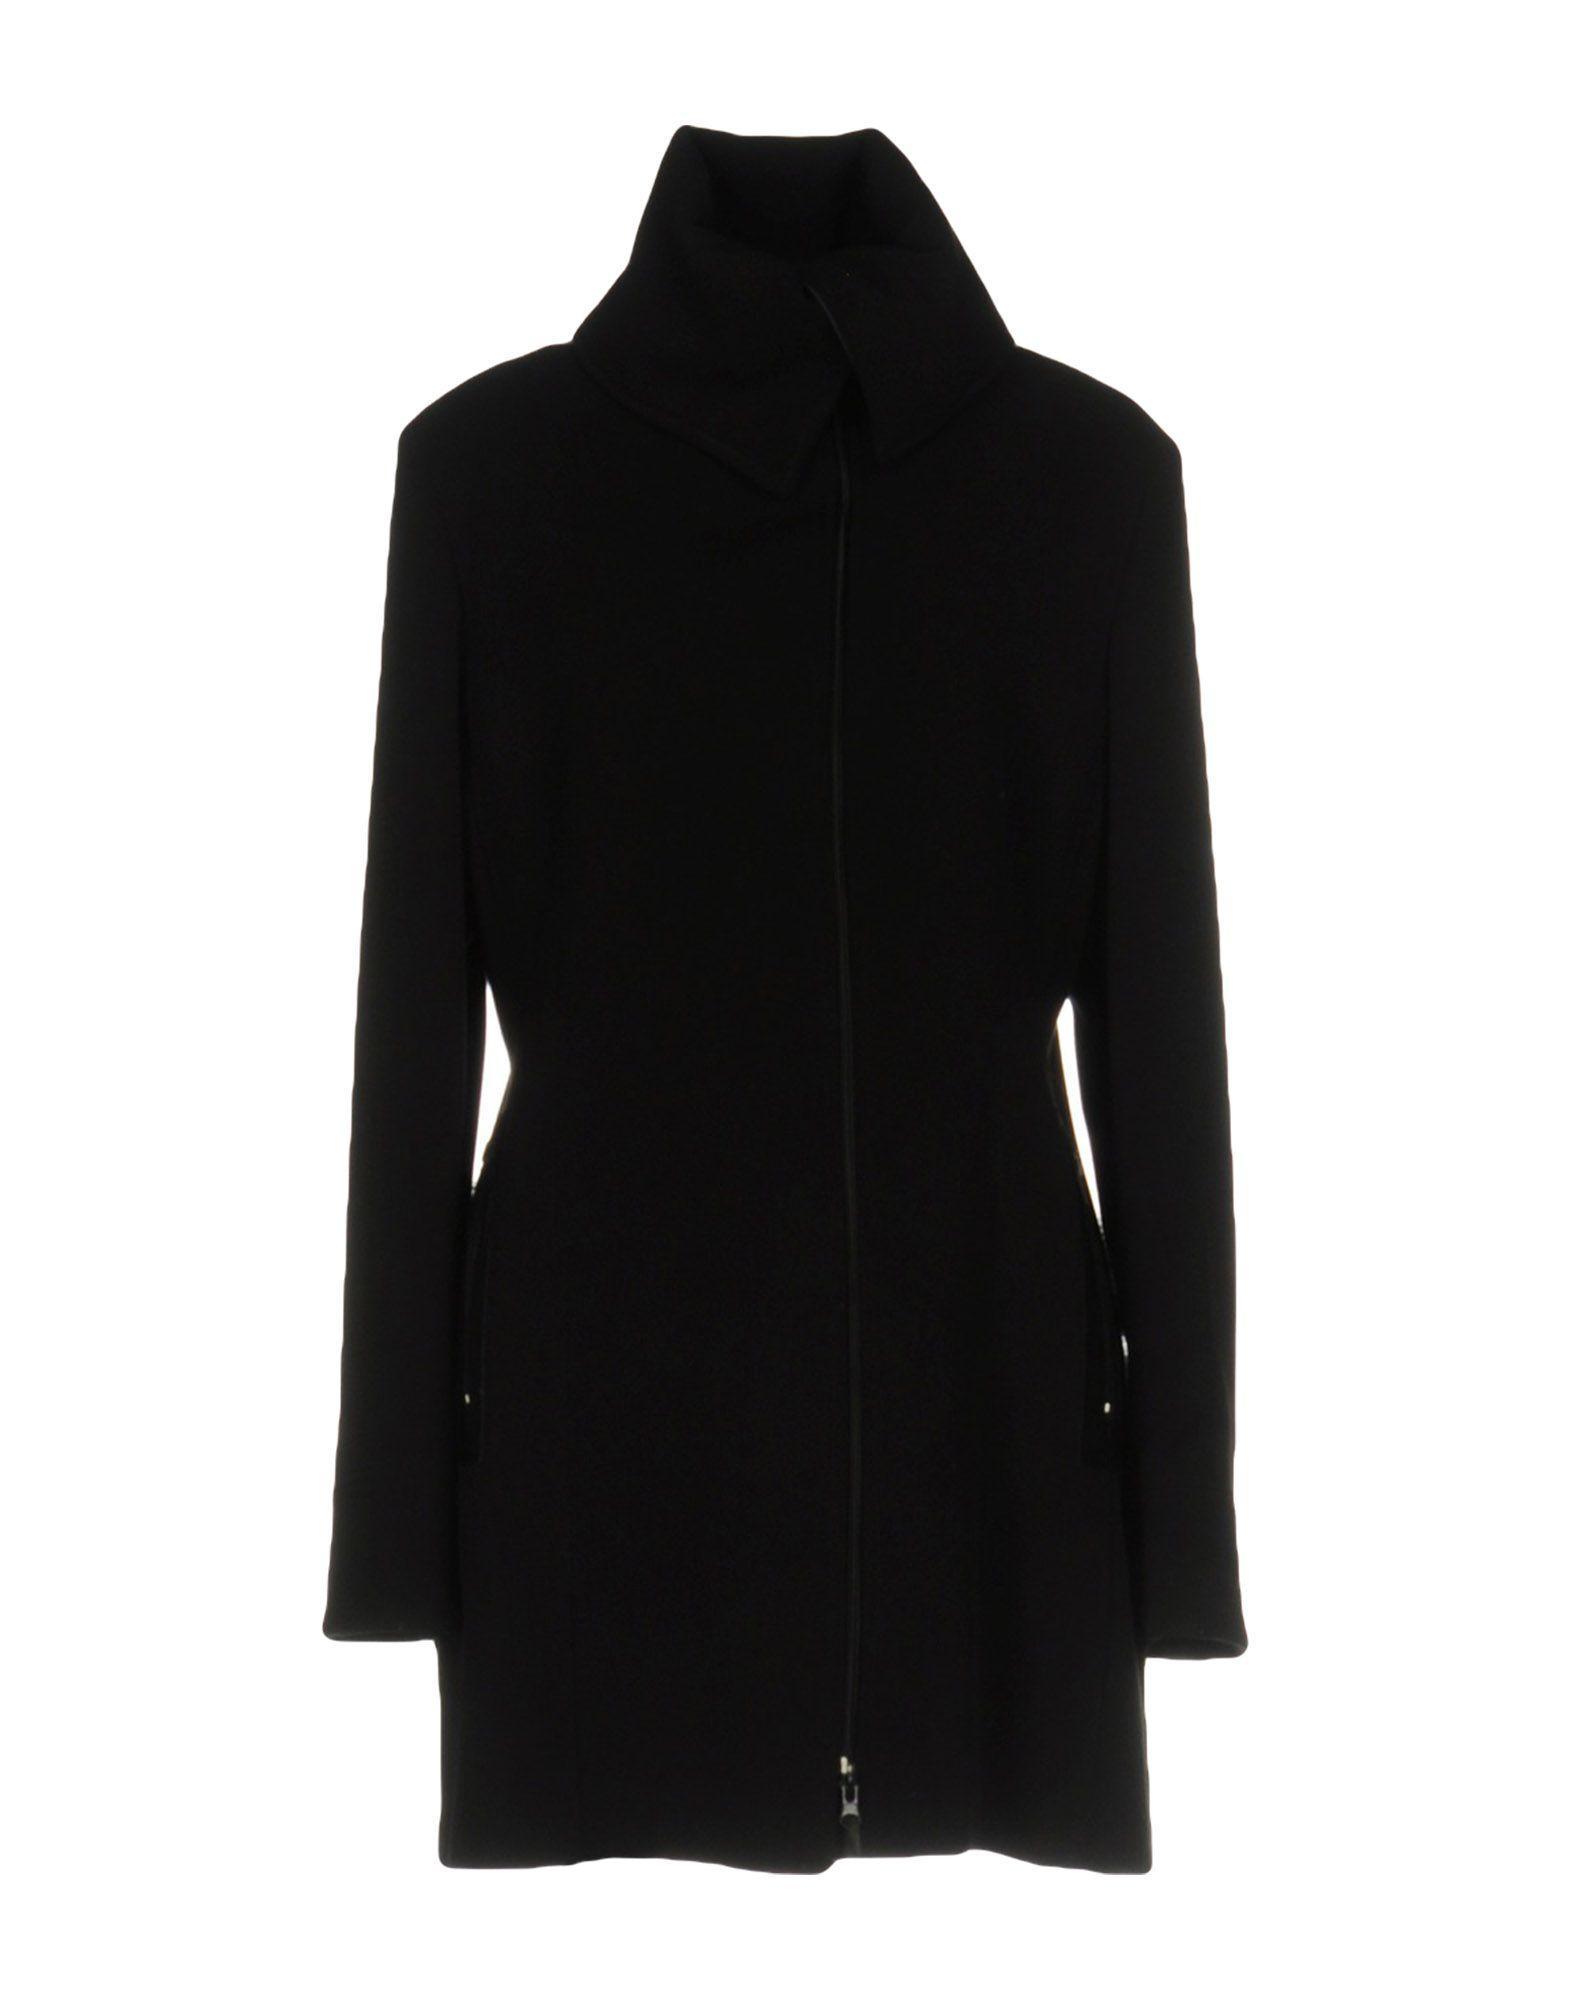 Hanita Coats In Black